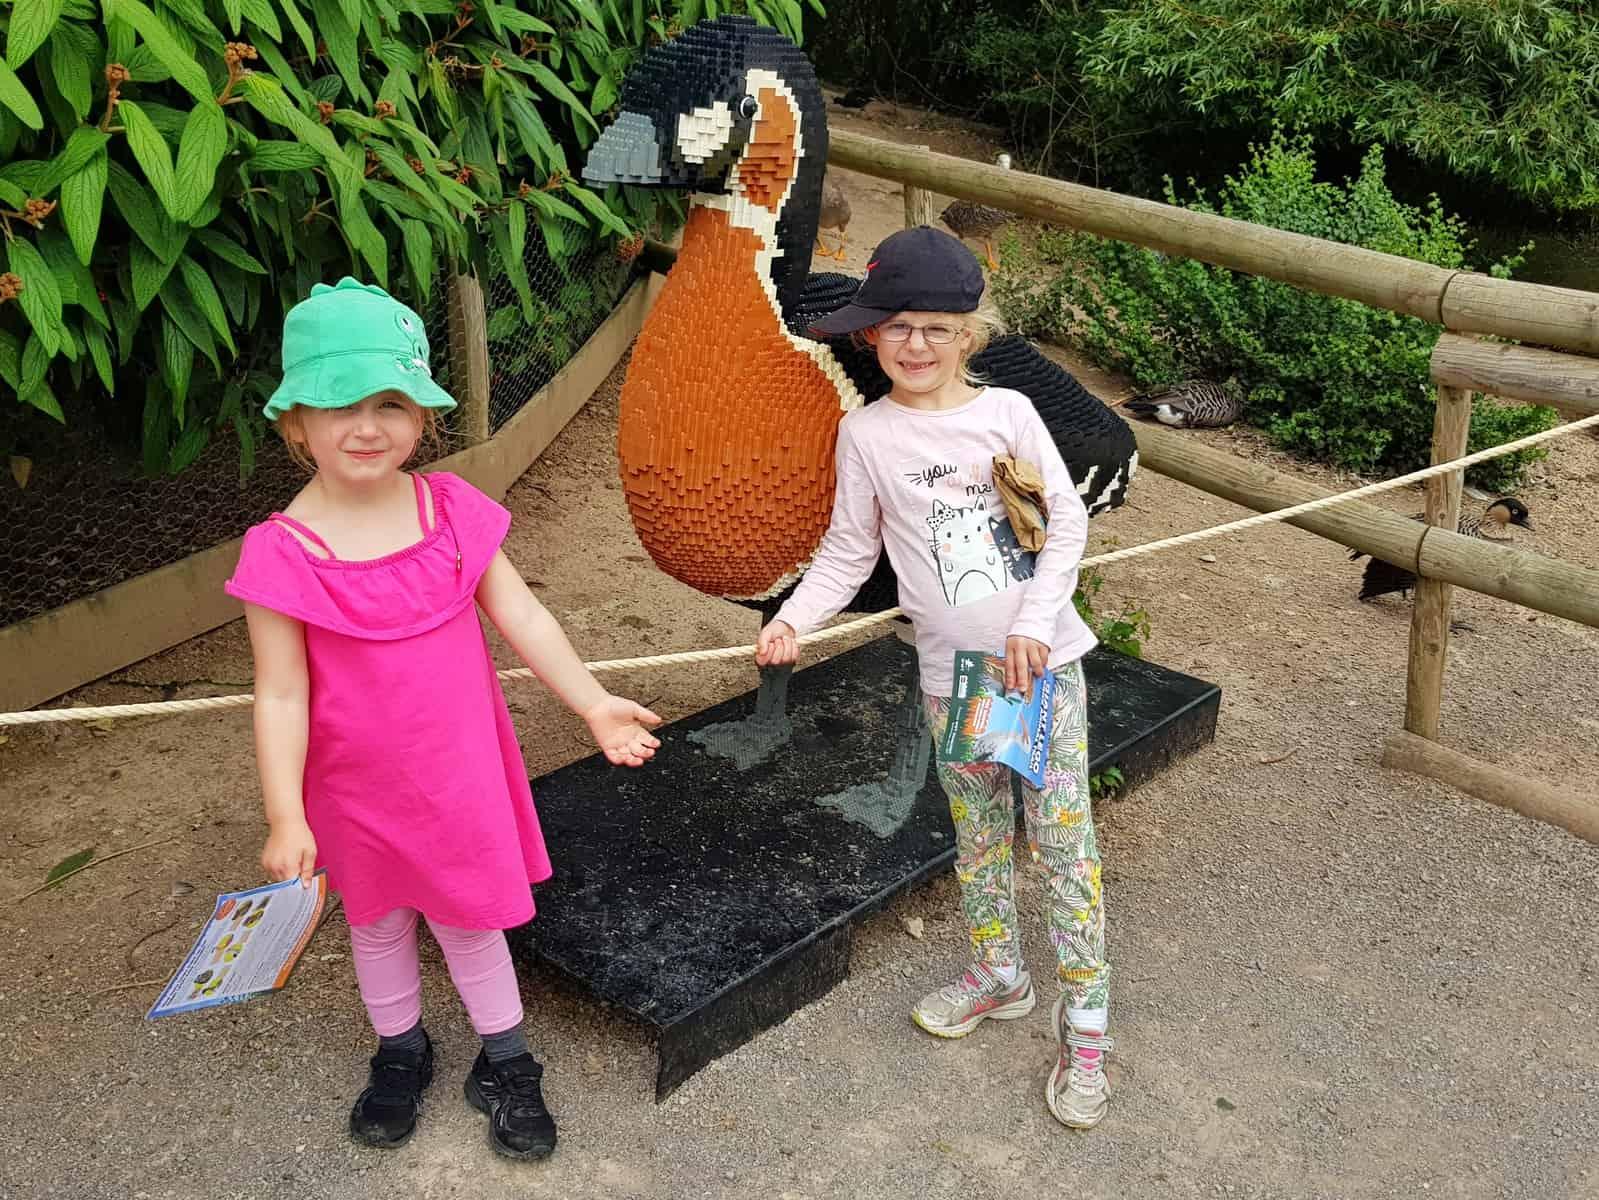 WWT Slimbridge, Gloucestershire - little girls with giant lego goose